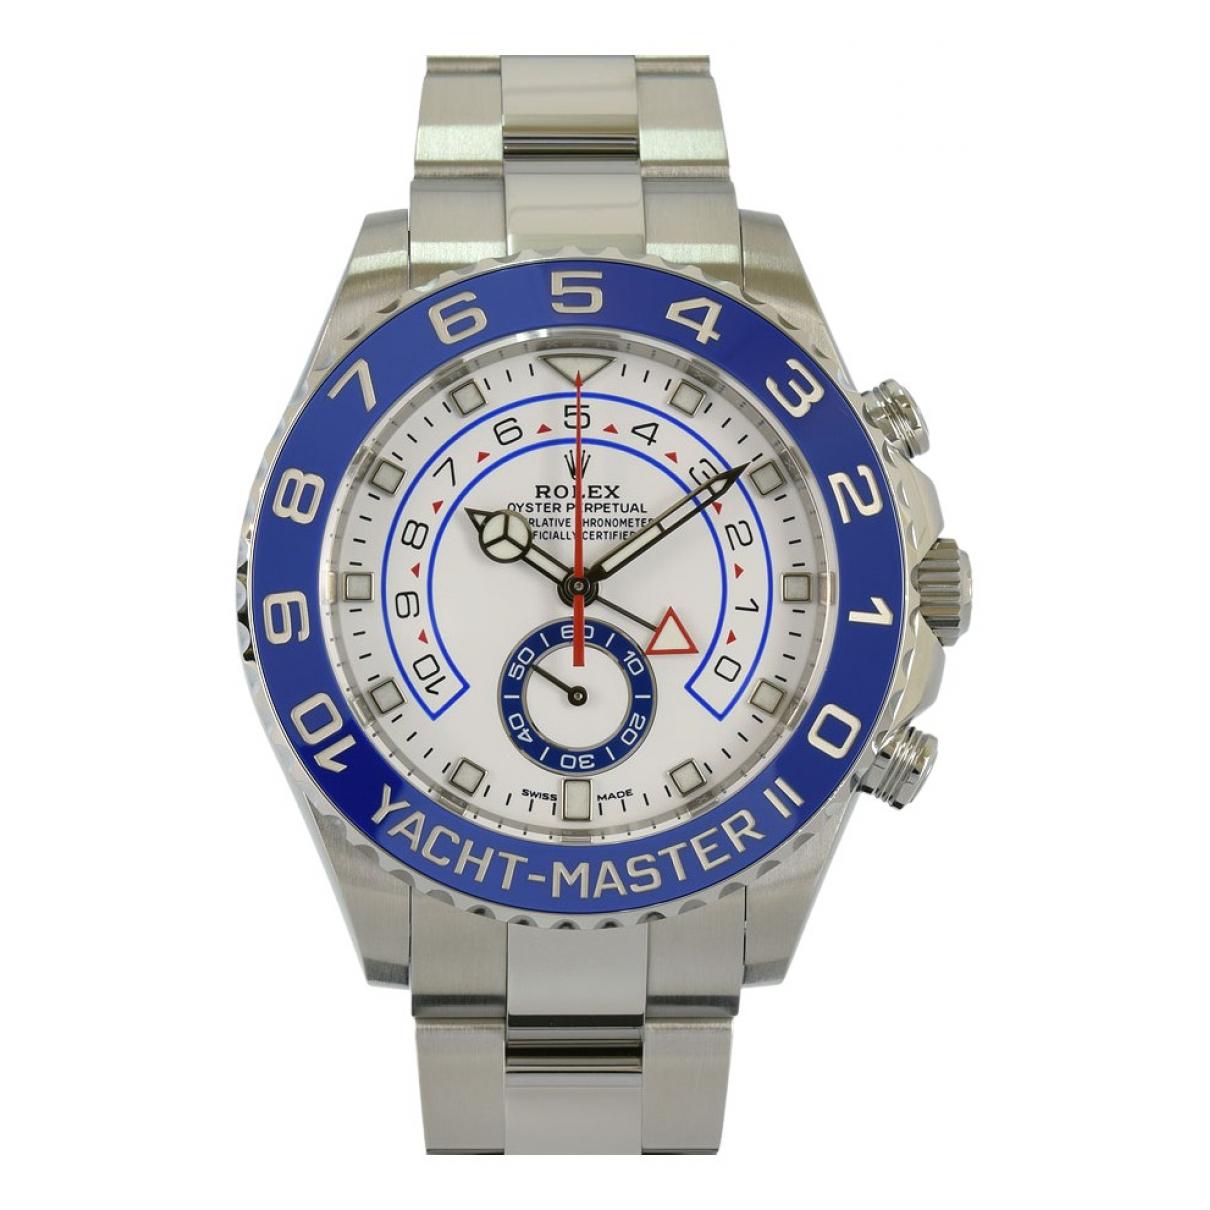 Relojes Yacht-Master ll Rolex